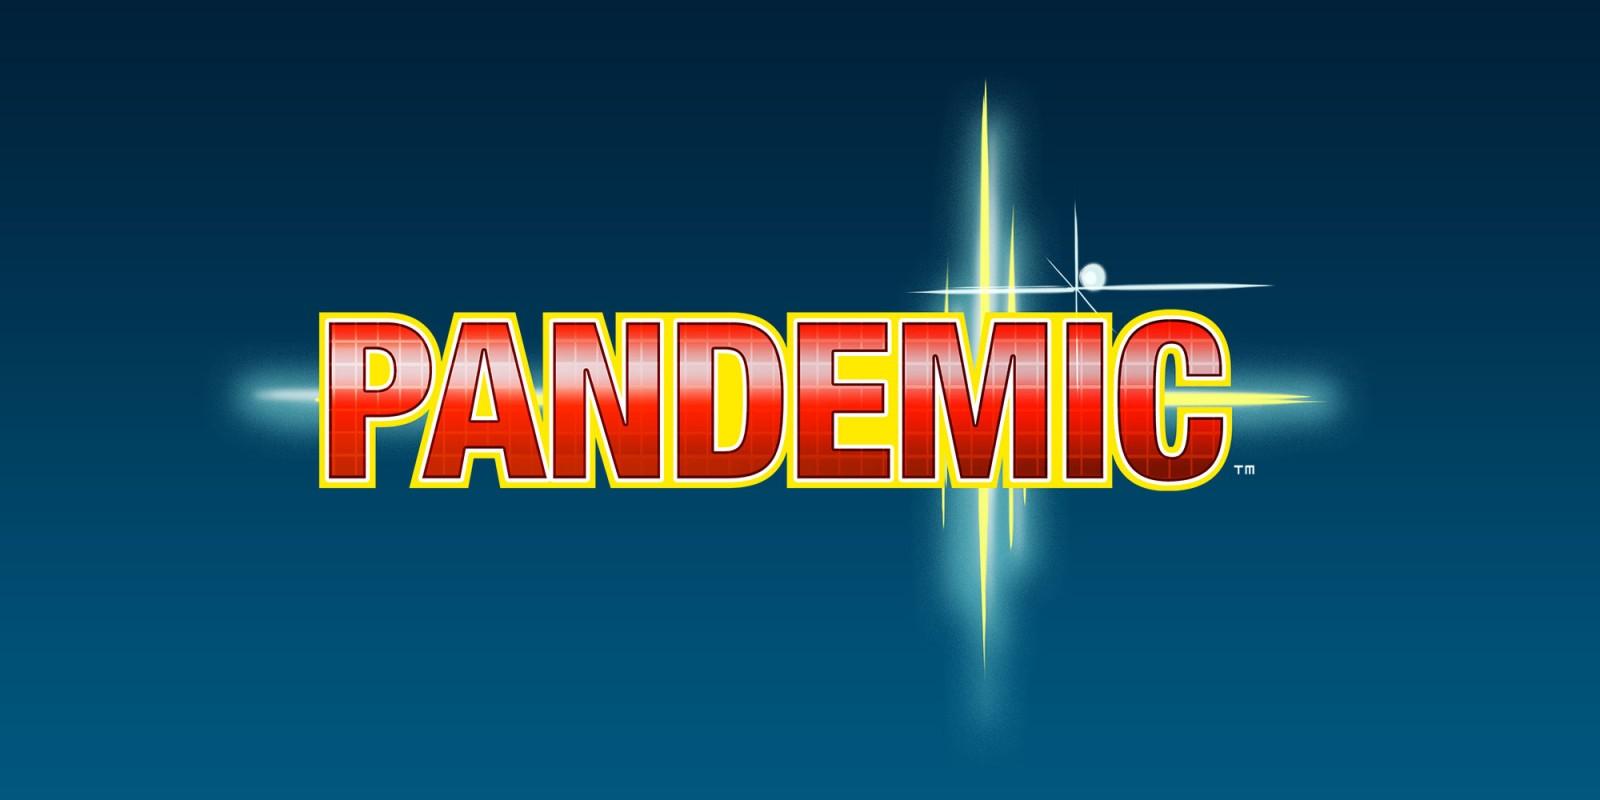 https://www.nintendo-town.fr/wp-content/uploads/2019/07/Pandemic.jpg